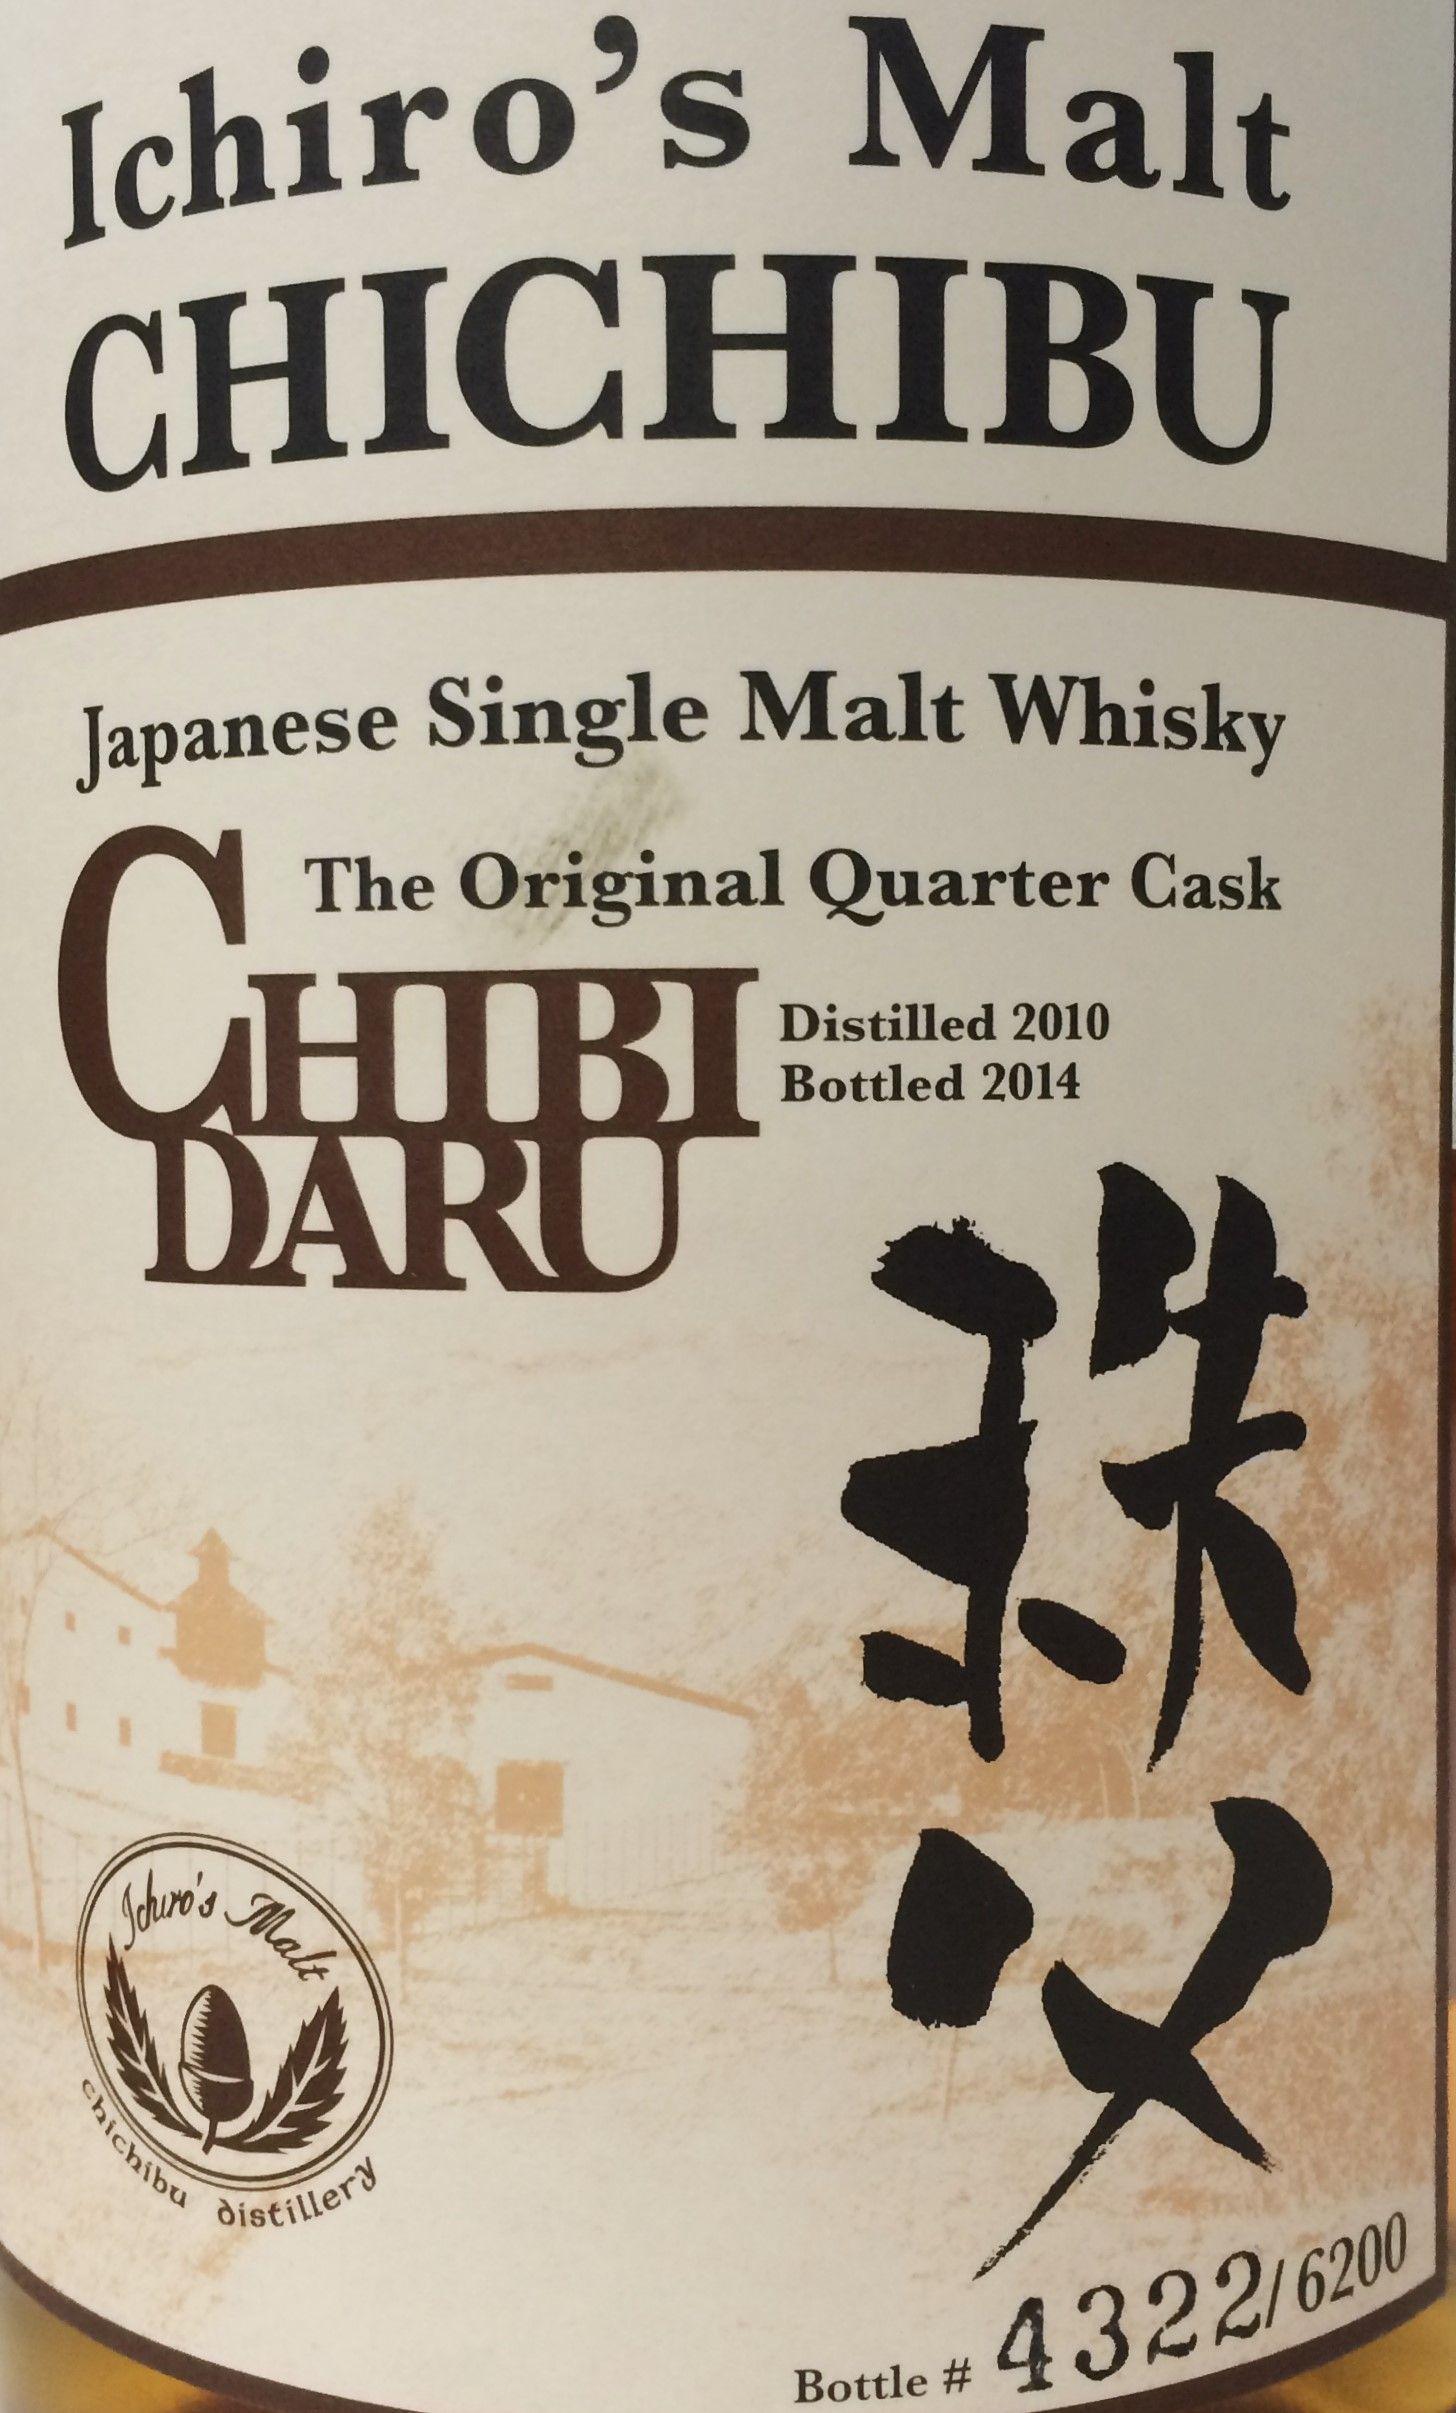 Chichibu Chibidaru 2010/2014 53.5% (6,200 bottles)